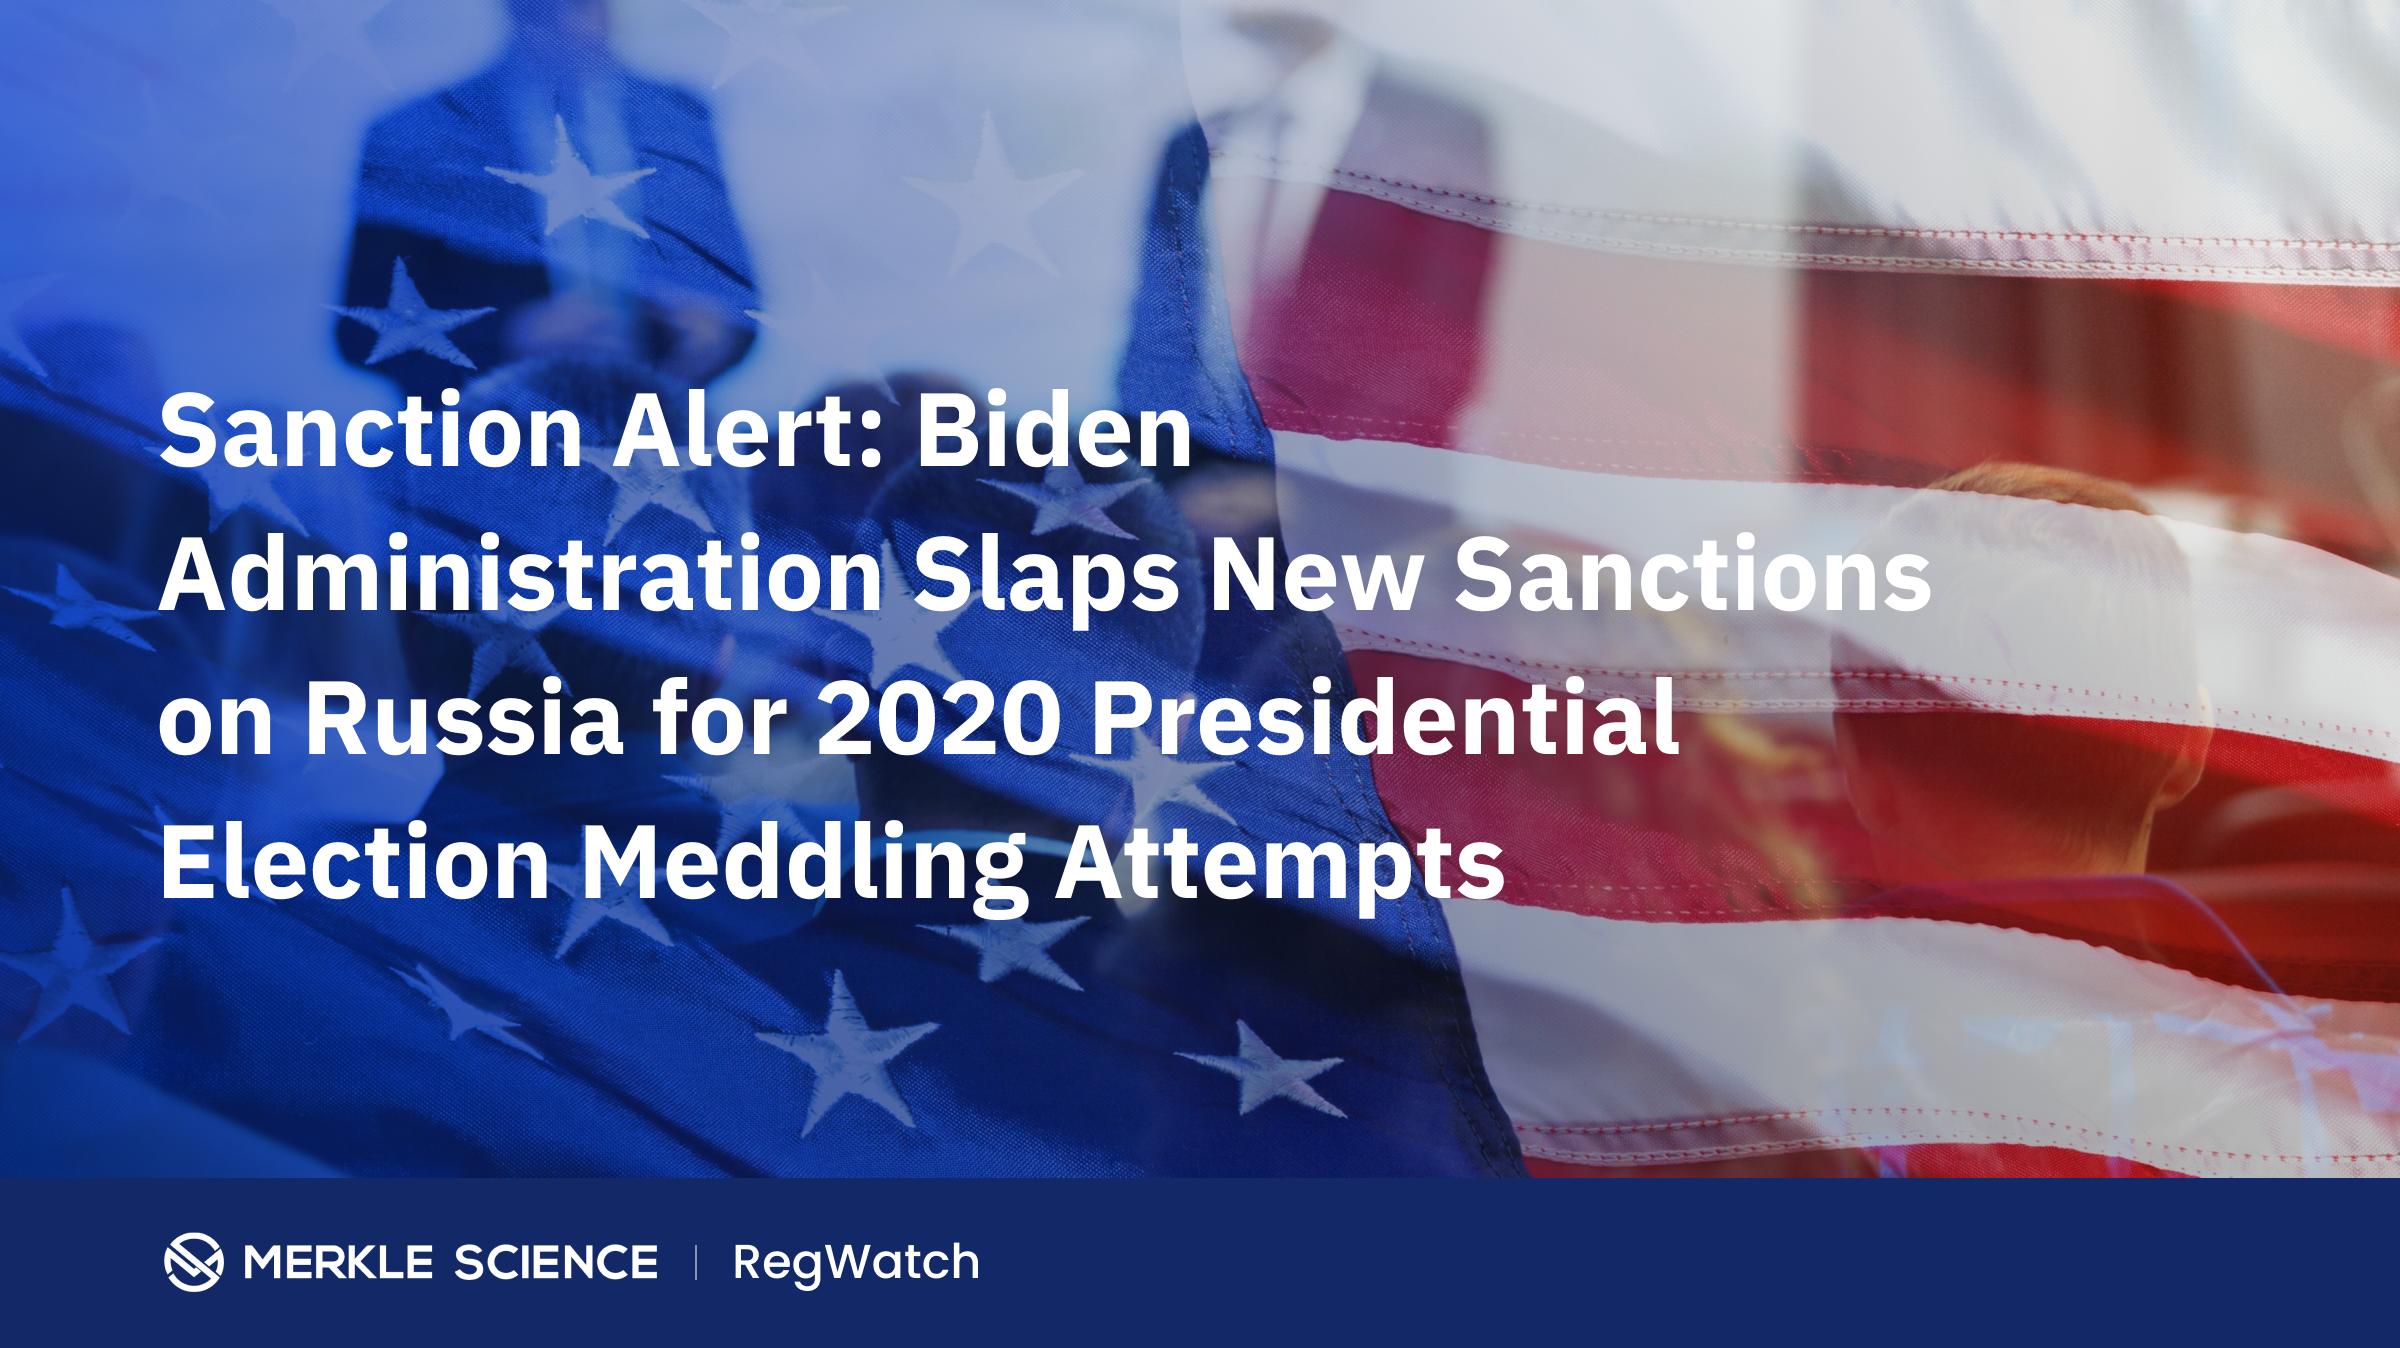 Sanction Alert: Biden Administration Slaps New Sanctions on Russia for 2020 Presidential Election Meddling Attempts